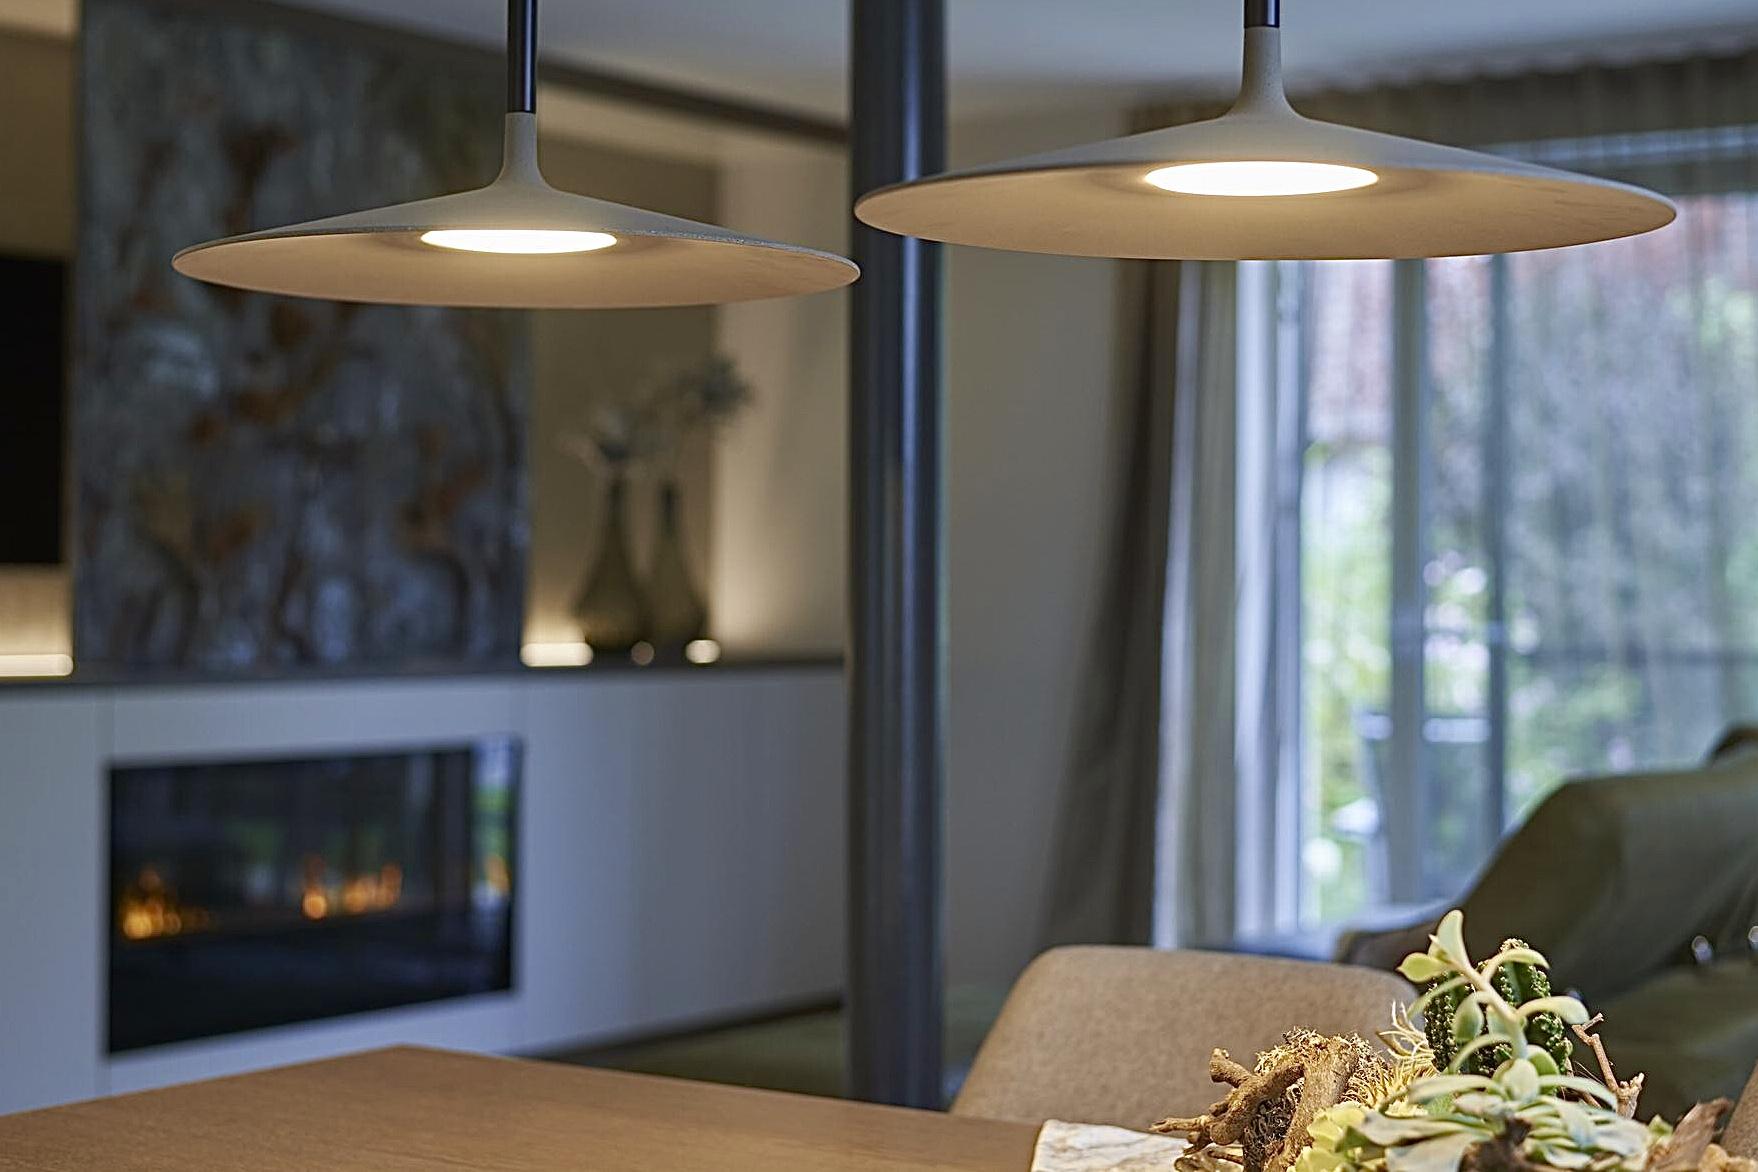 interior-design-lampen-esstisch